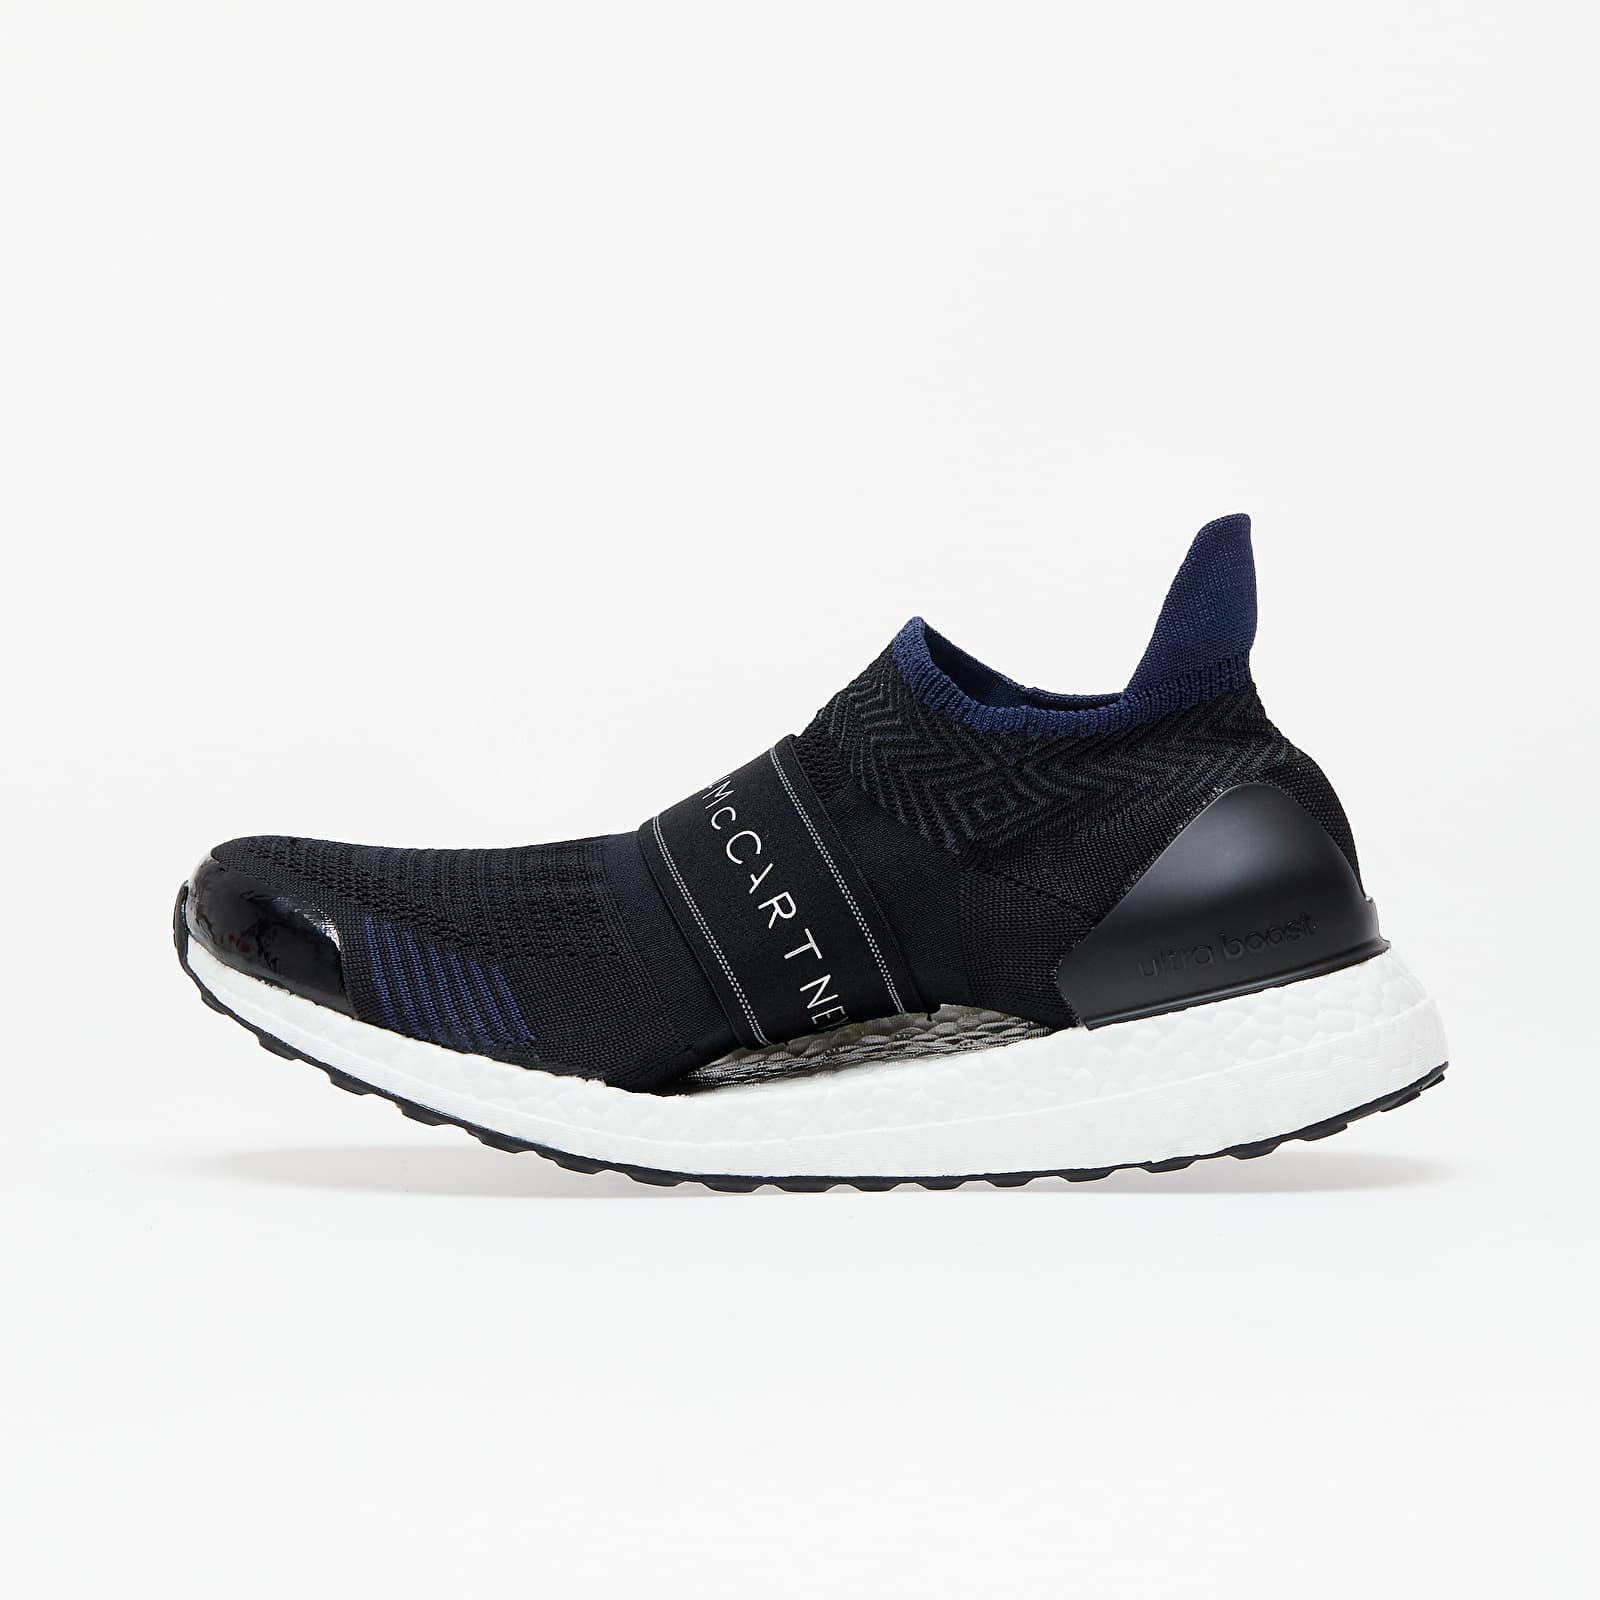 Női cipők adidas x Stella McCartney Ultraboost X 3.D. S. Core Black/ Core Black/ Core Black